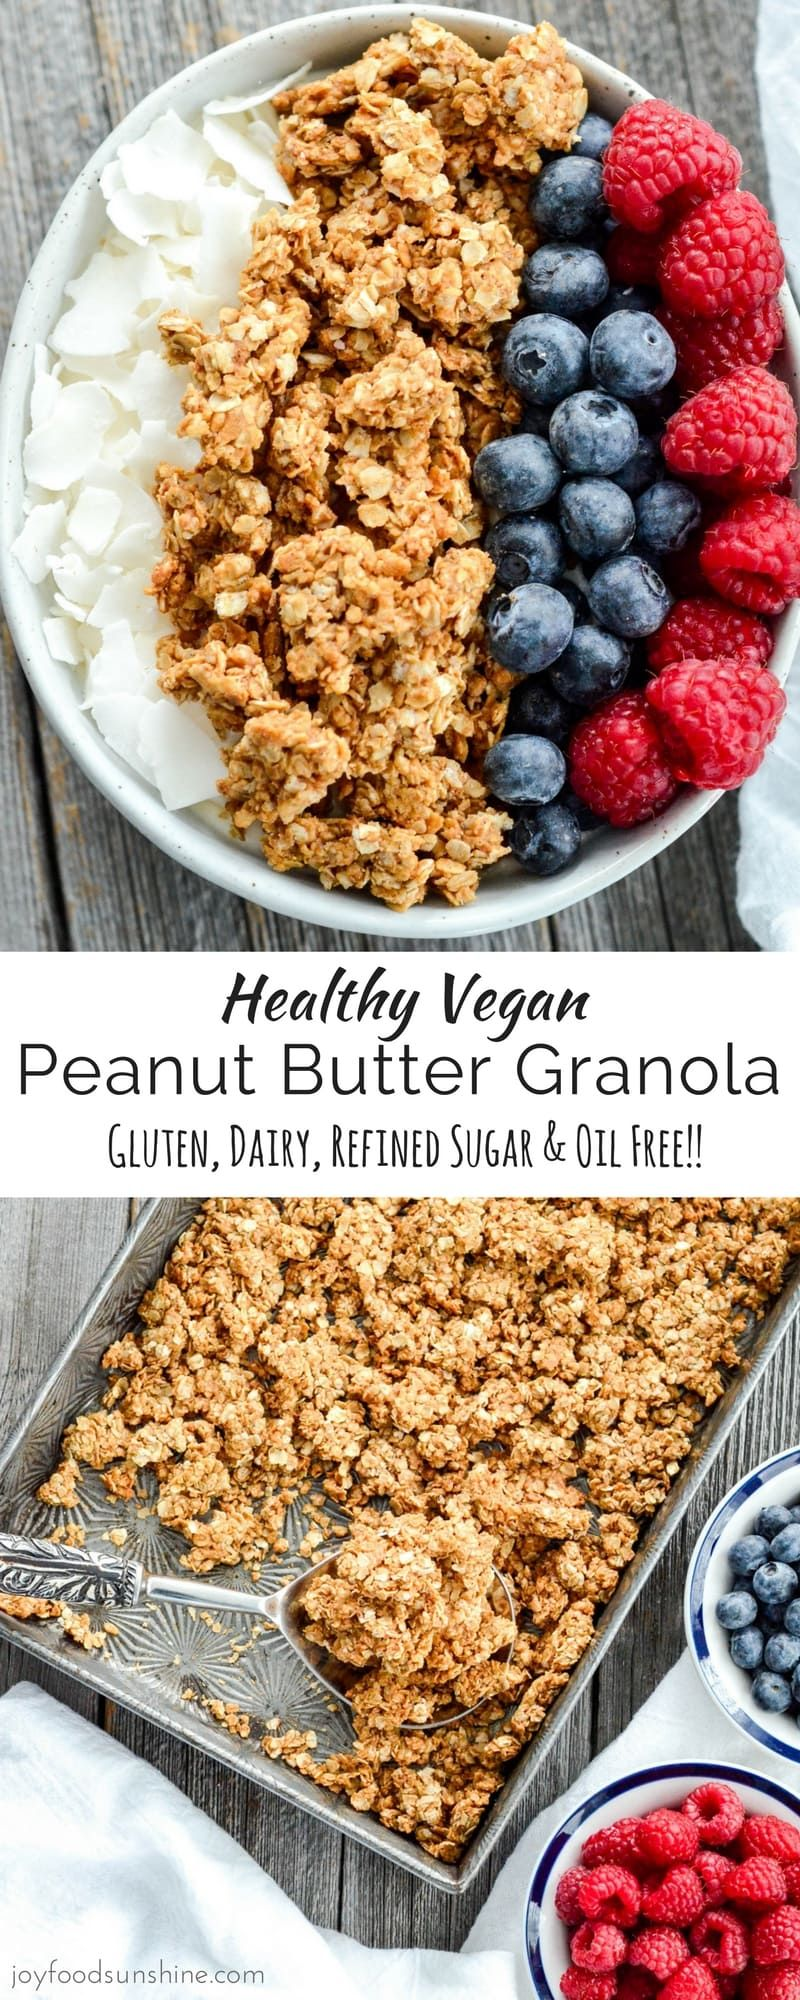 Healthy Peanut Butter Granola – JoyFoodSunshine